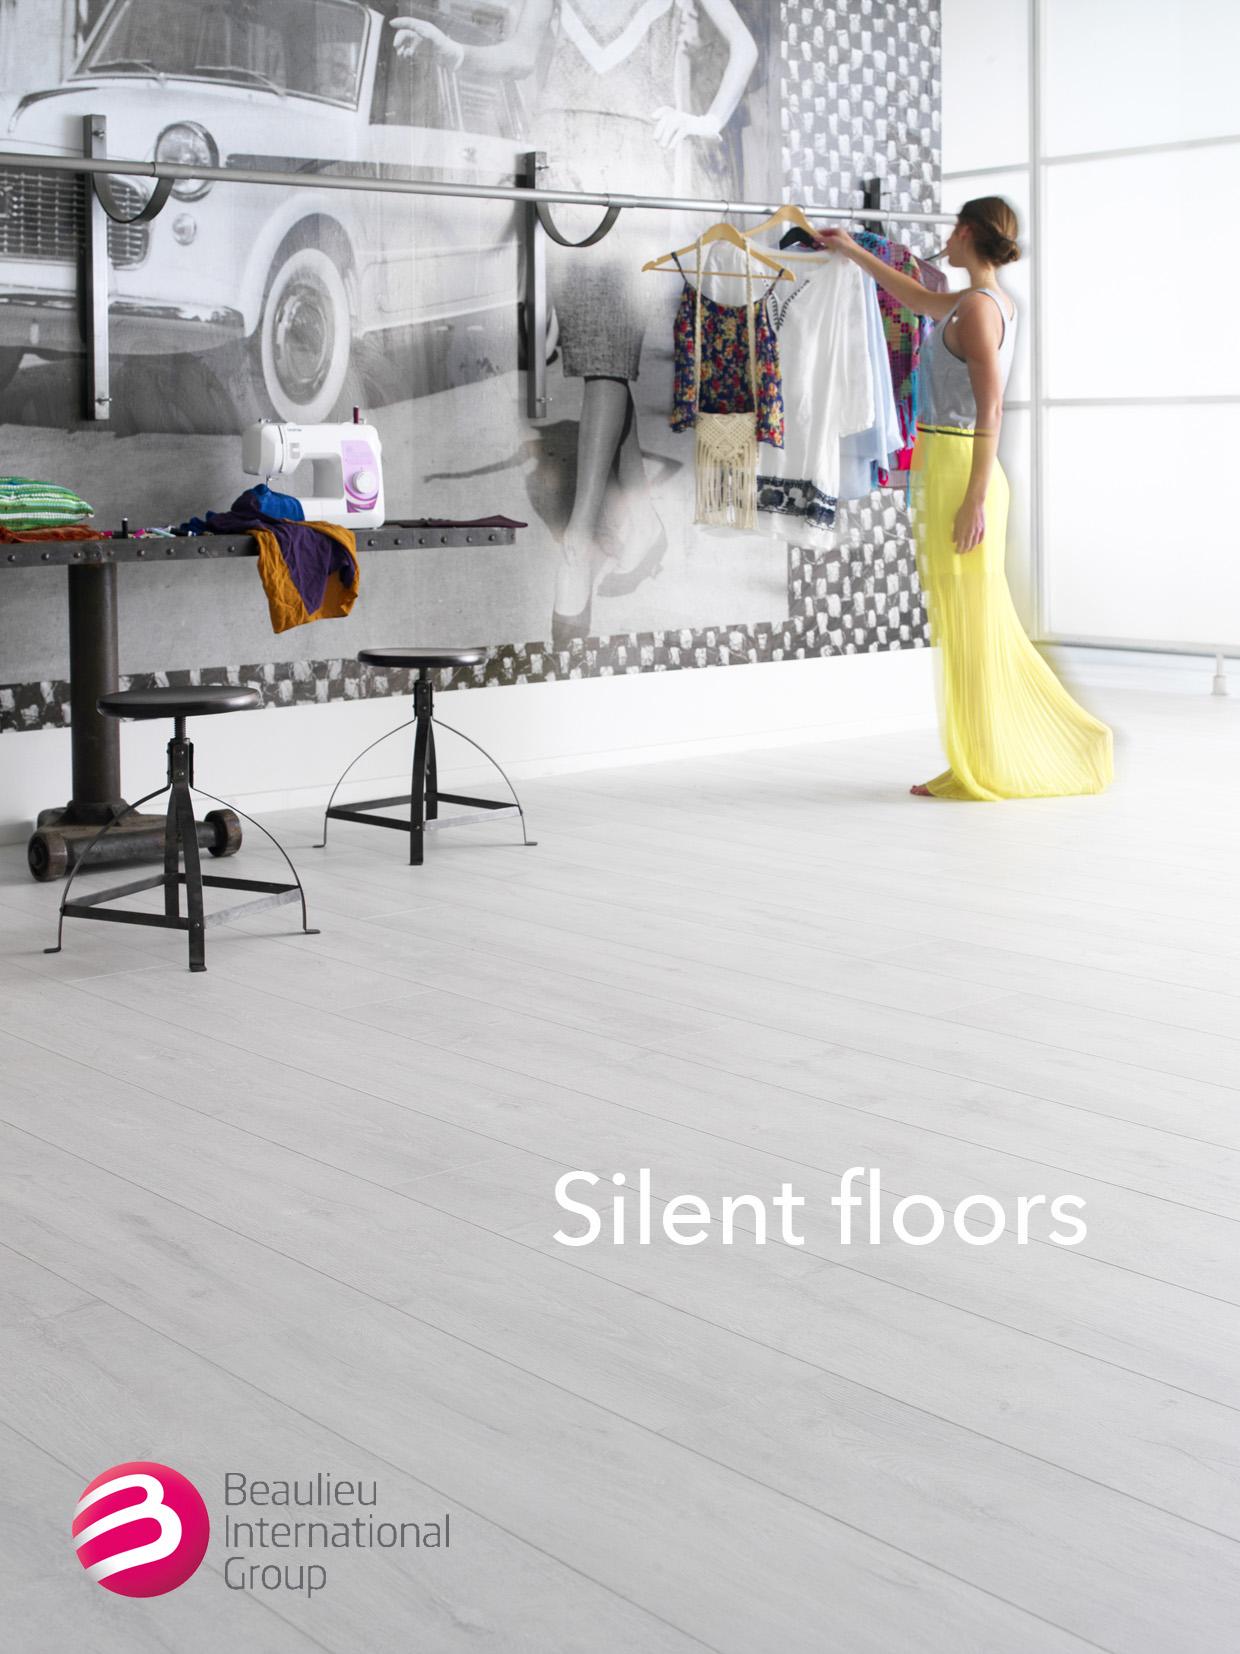 Silent floors